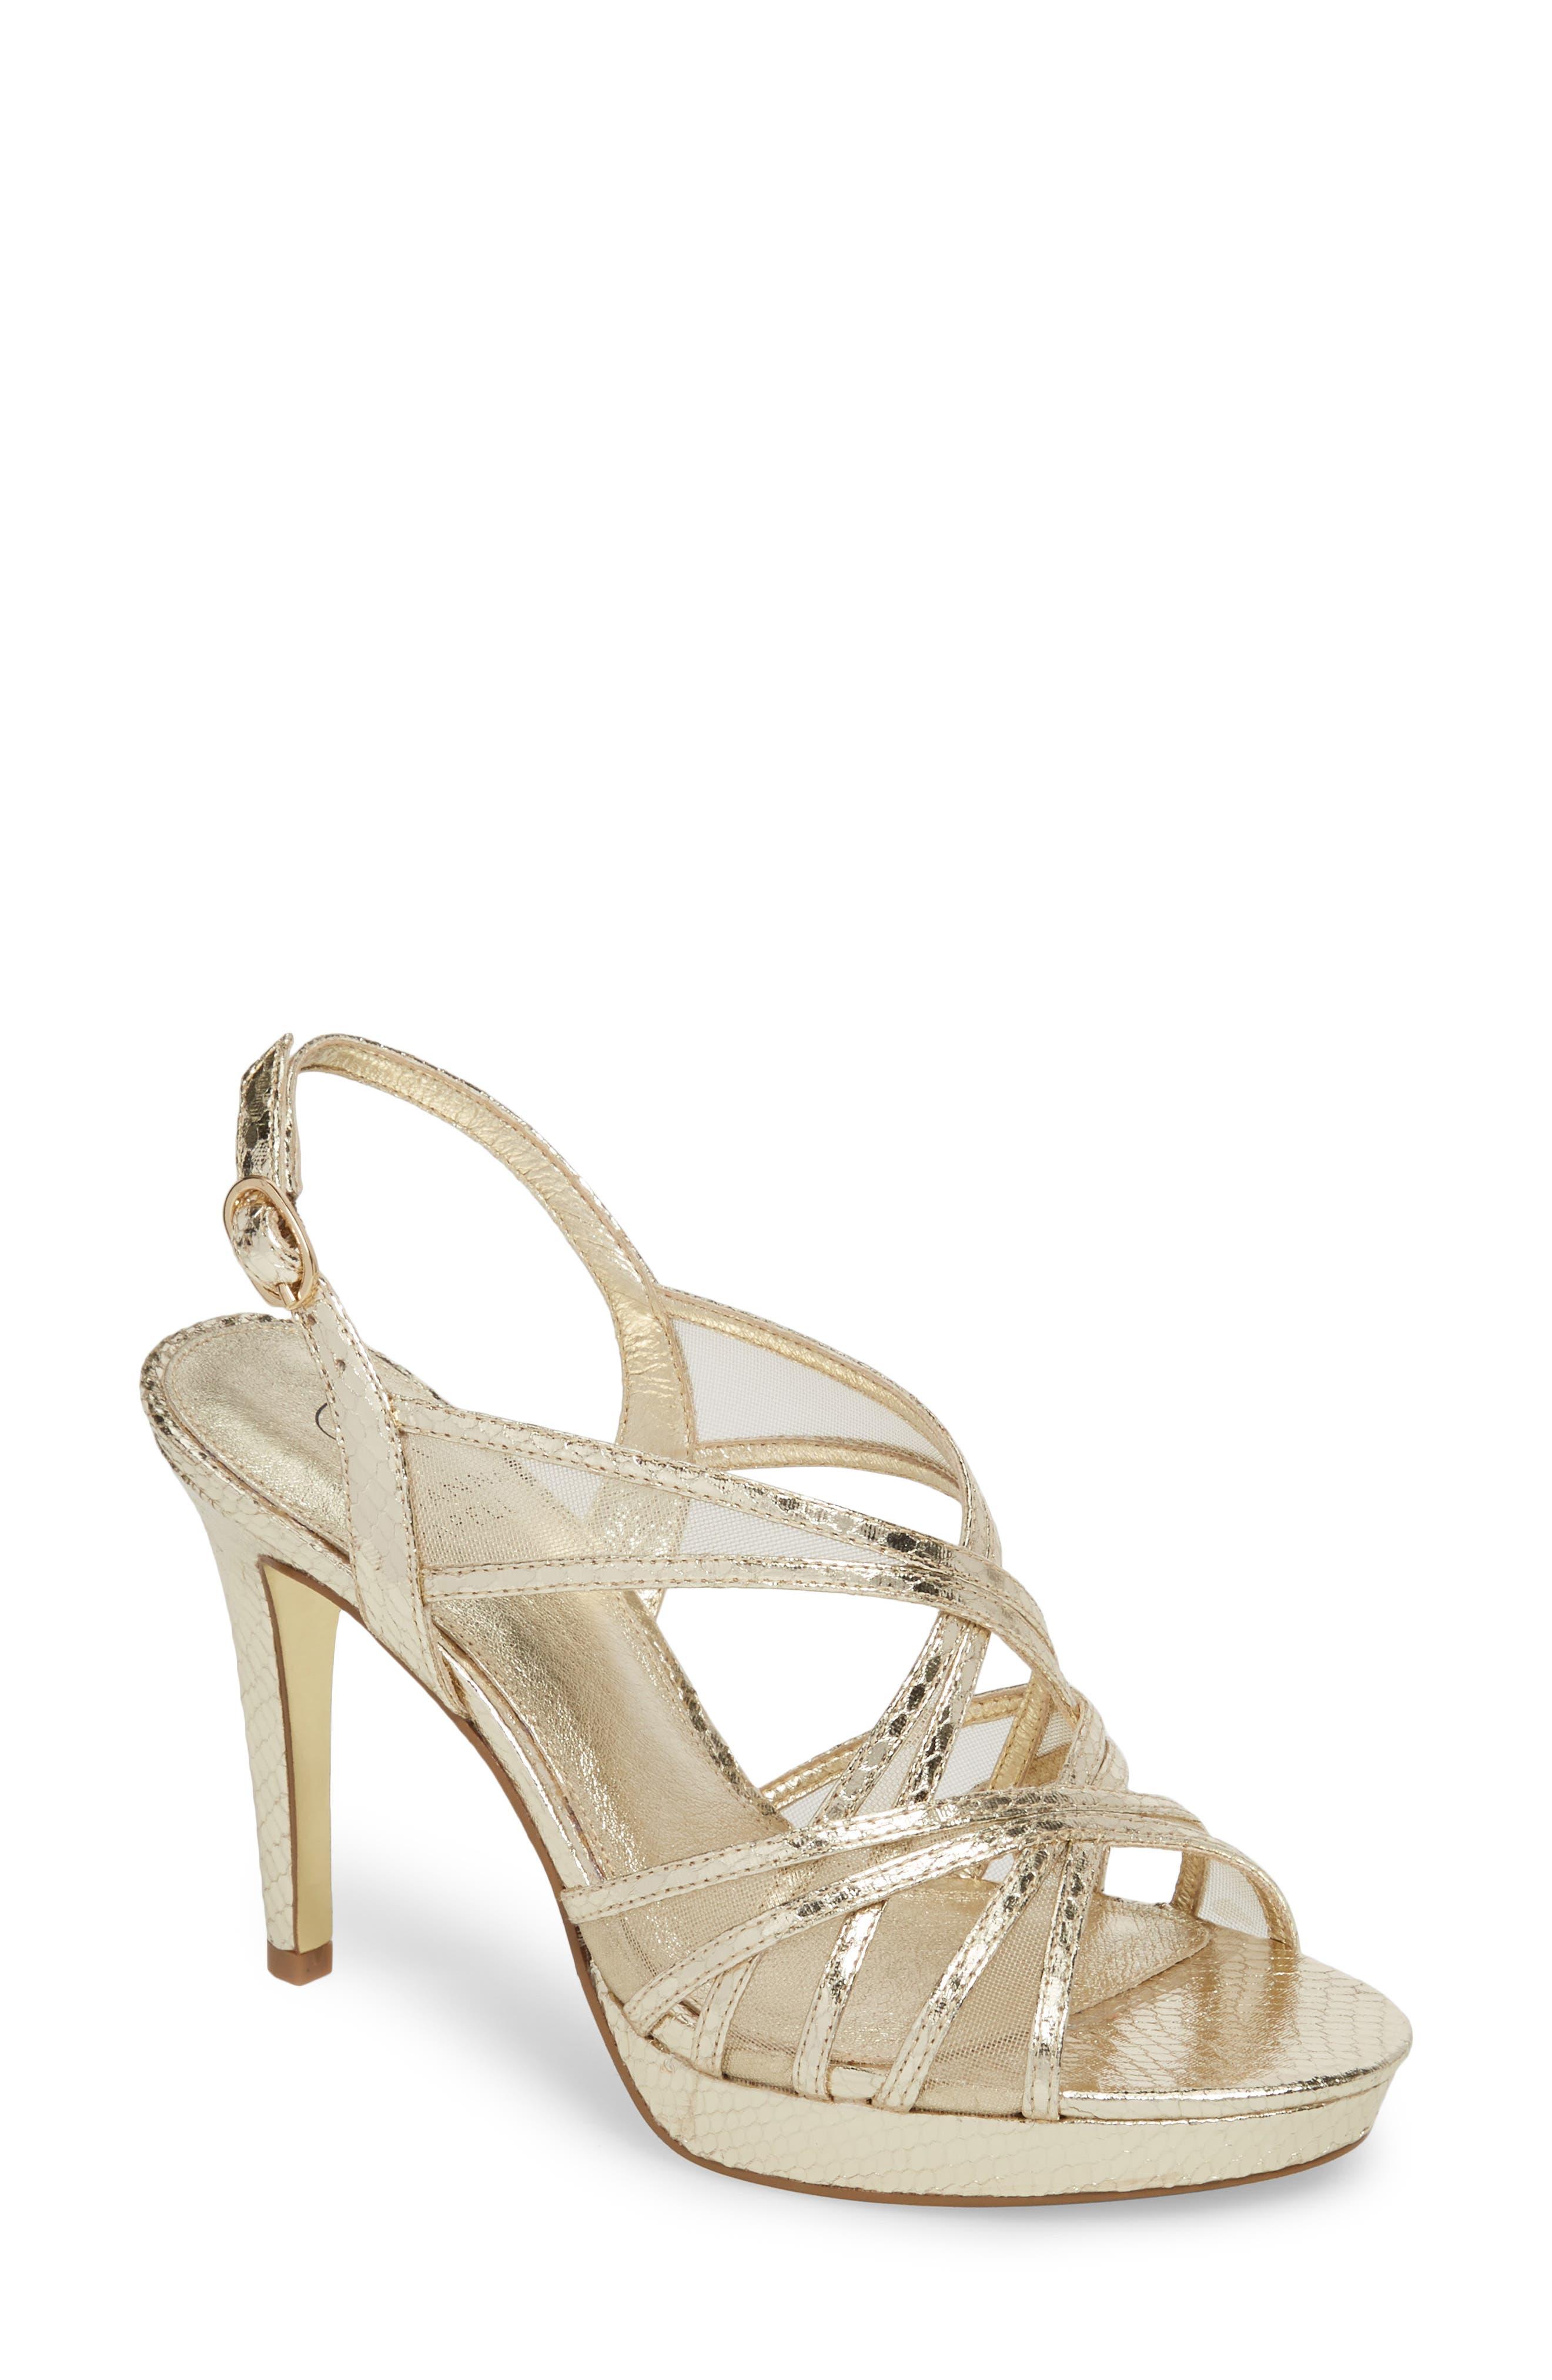 Adrianna Papell Women's Adri Platform Sandal